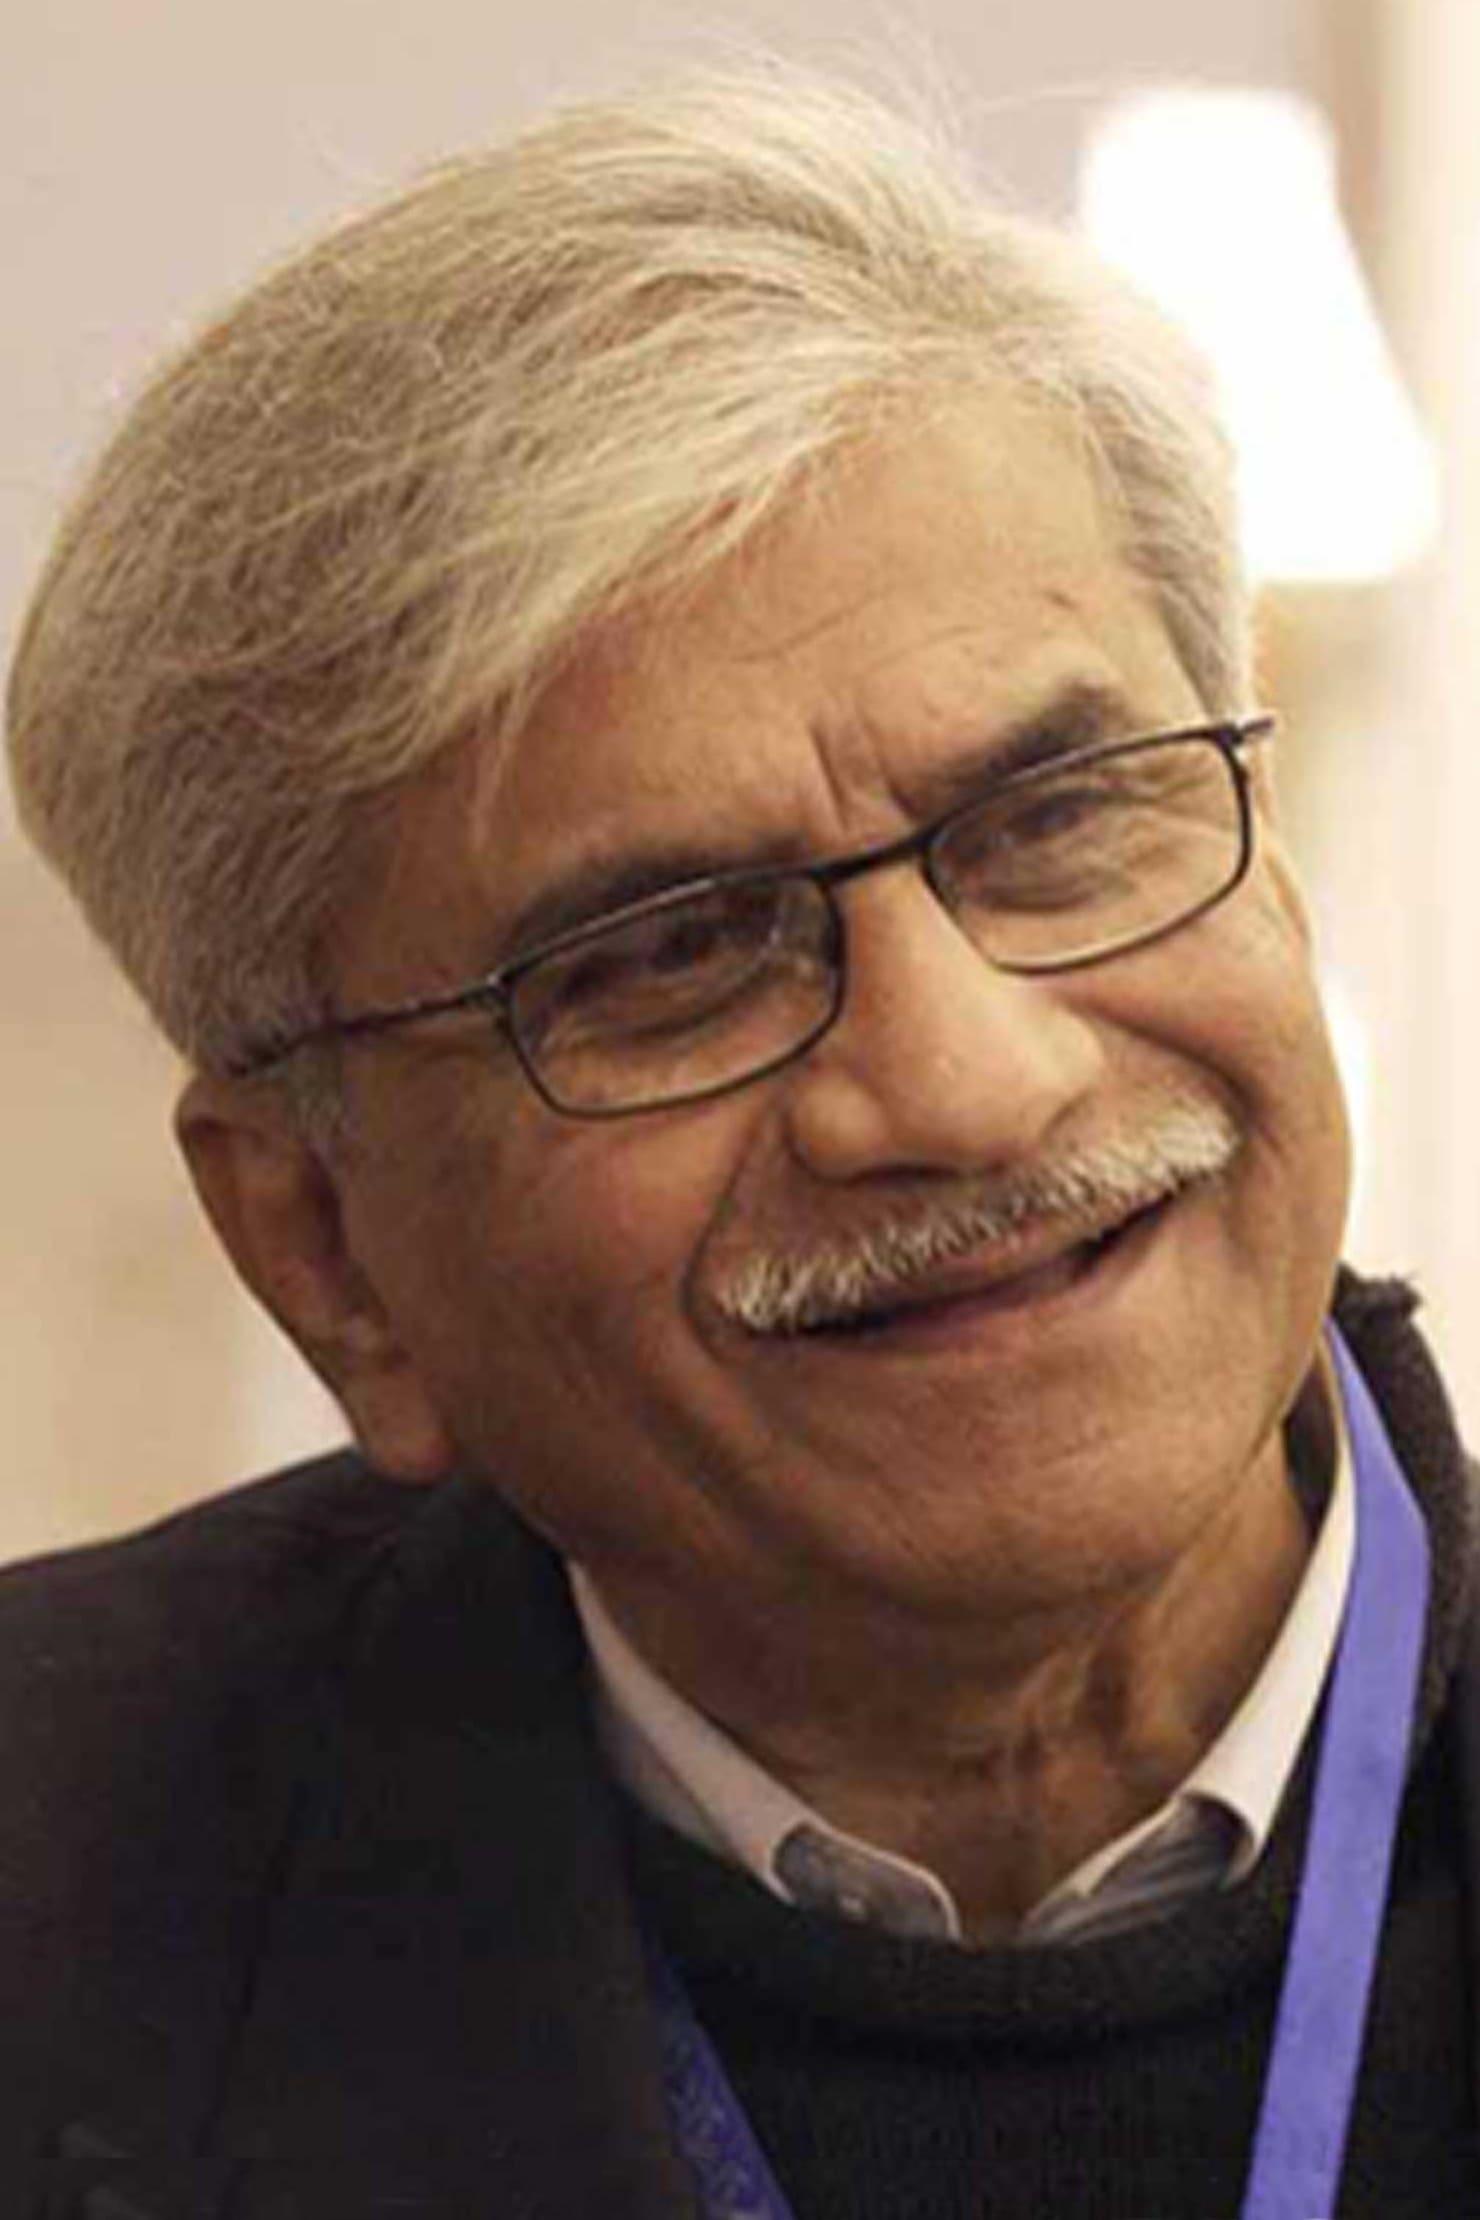 Jabbar Patel